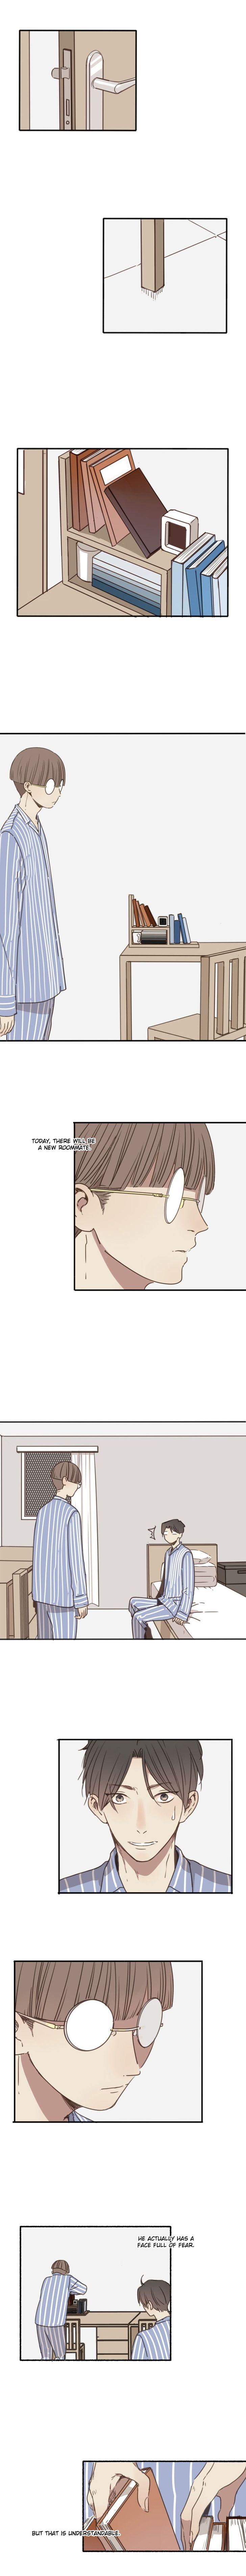 https://im.nineanime.com/comics/pic9/57/20473/452998/SilentColor2110882.jpg Page 1